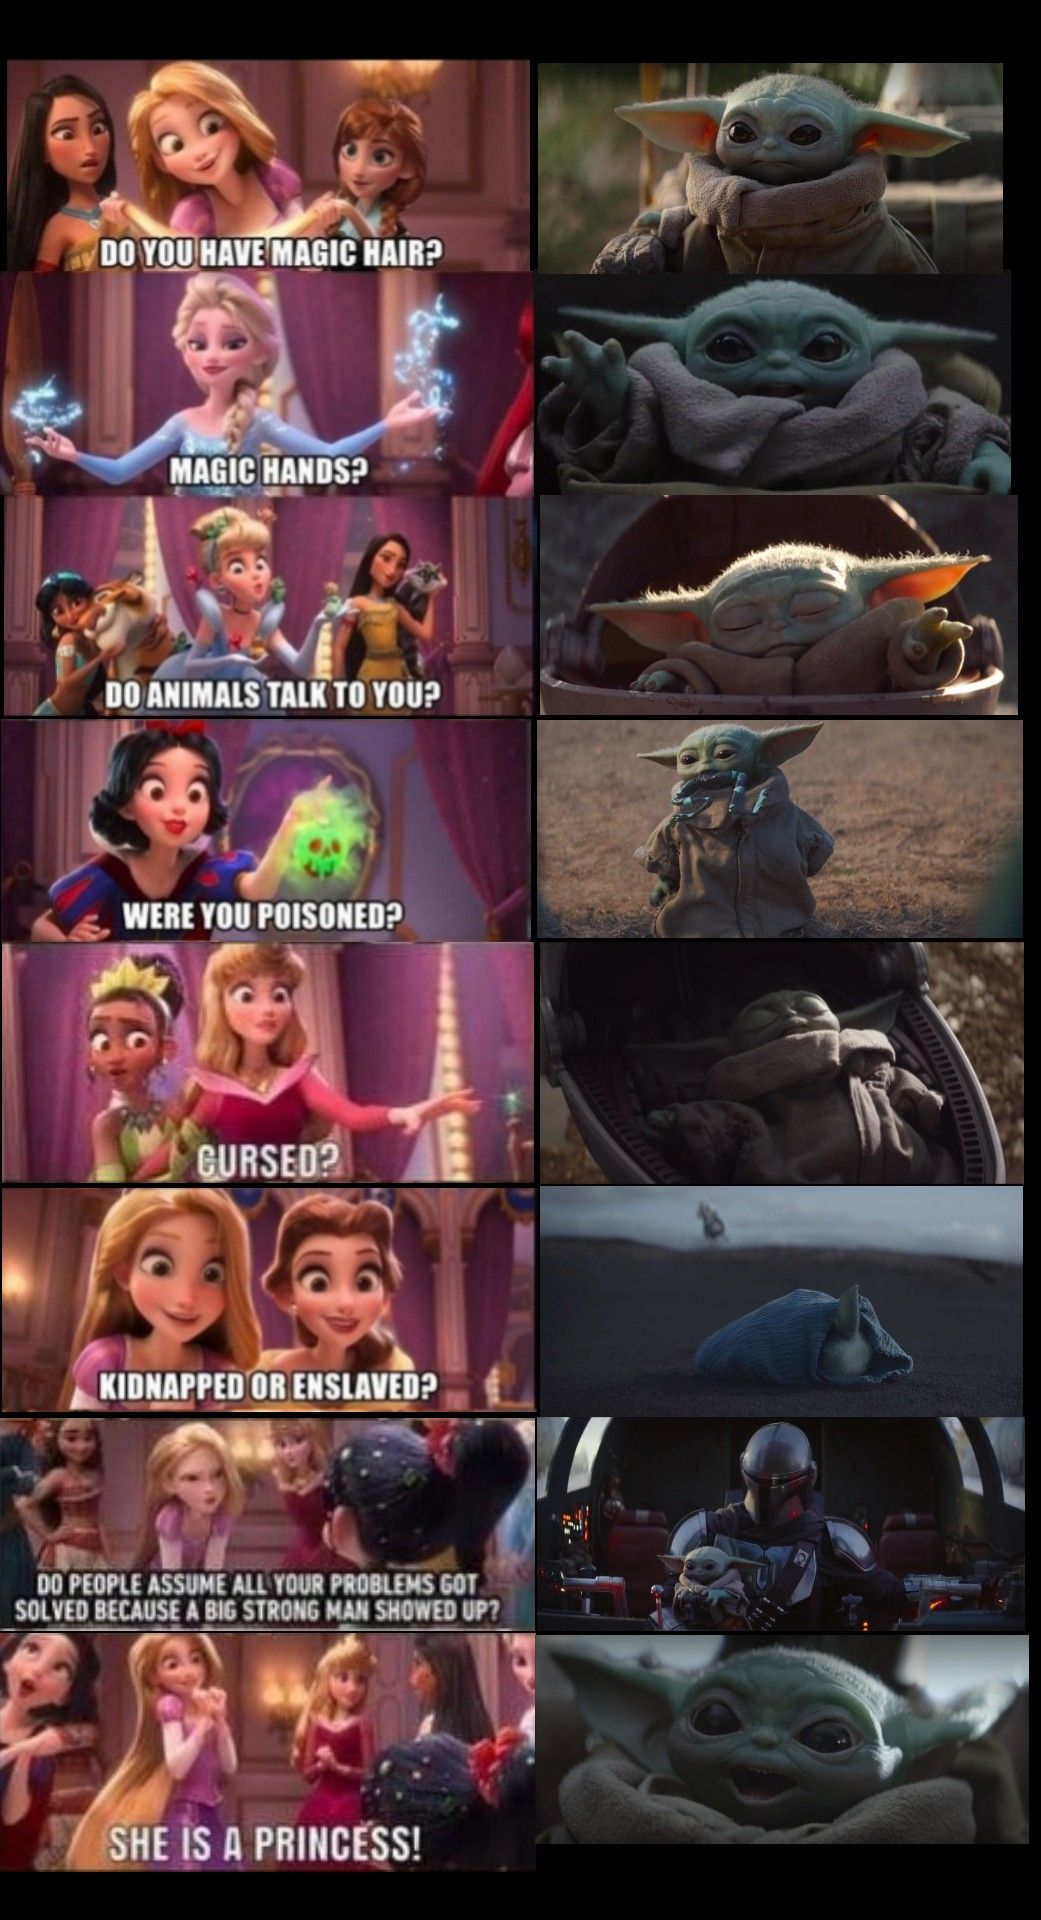 Baby Yoda Is A Disney Princess Lol Funny Star Wars Memes Yoda Funny Star Wars Jokes